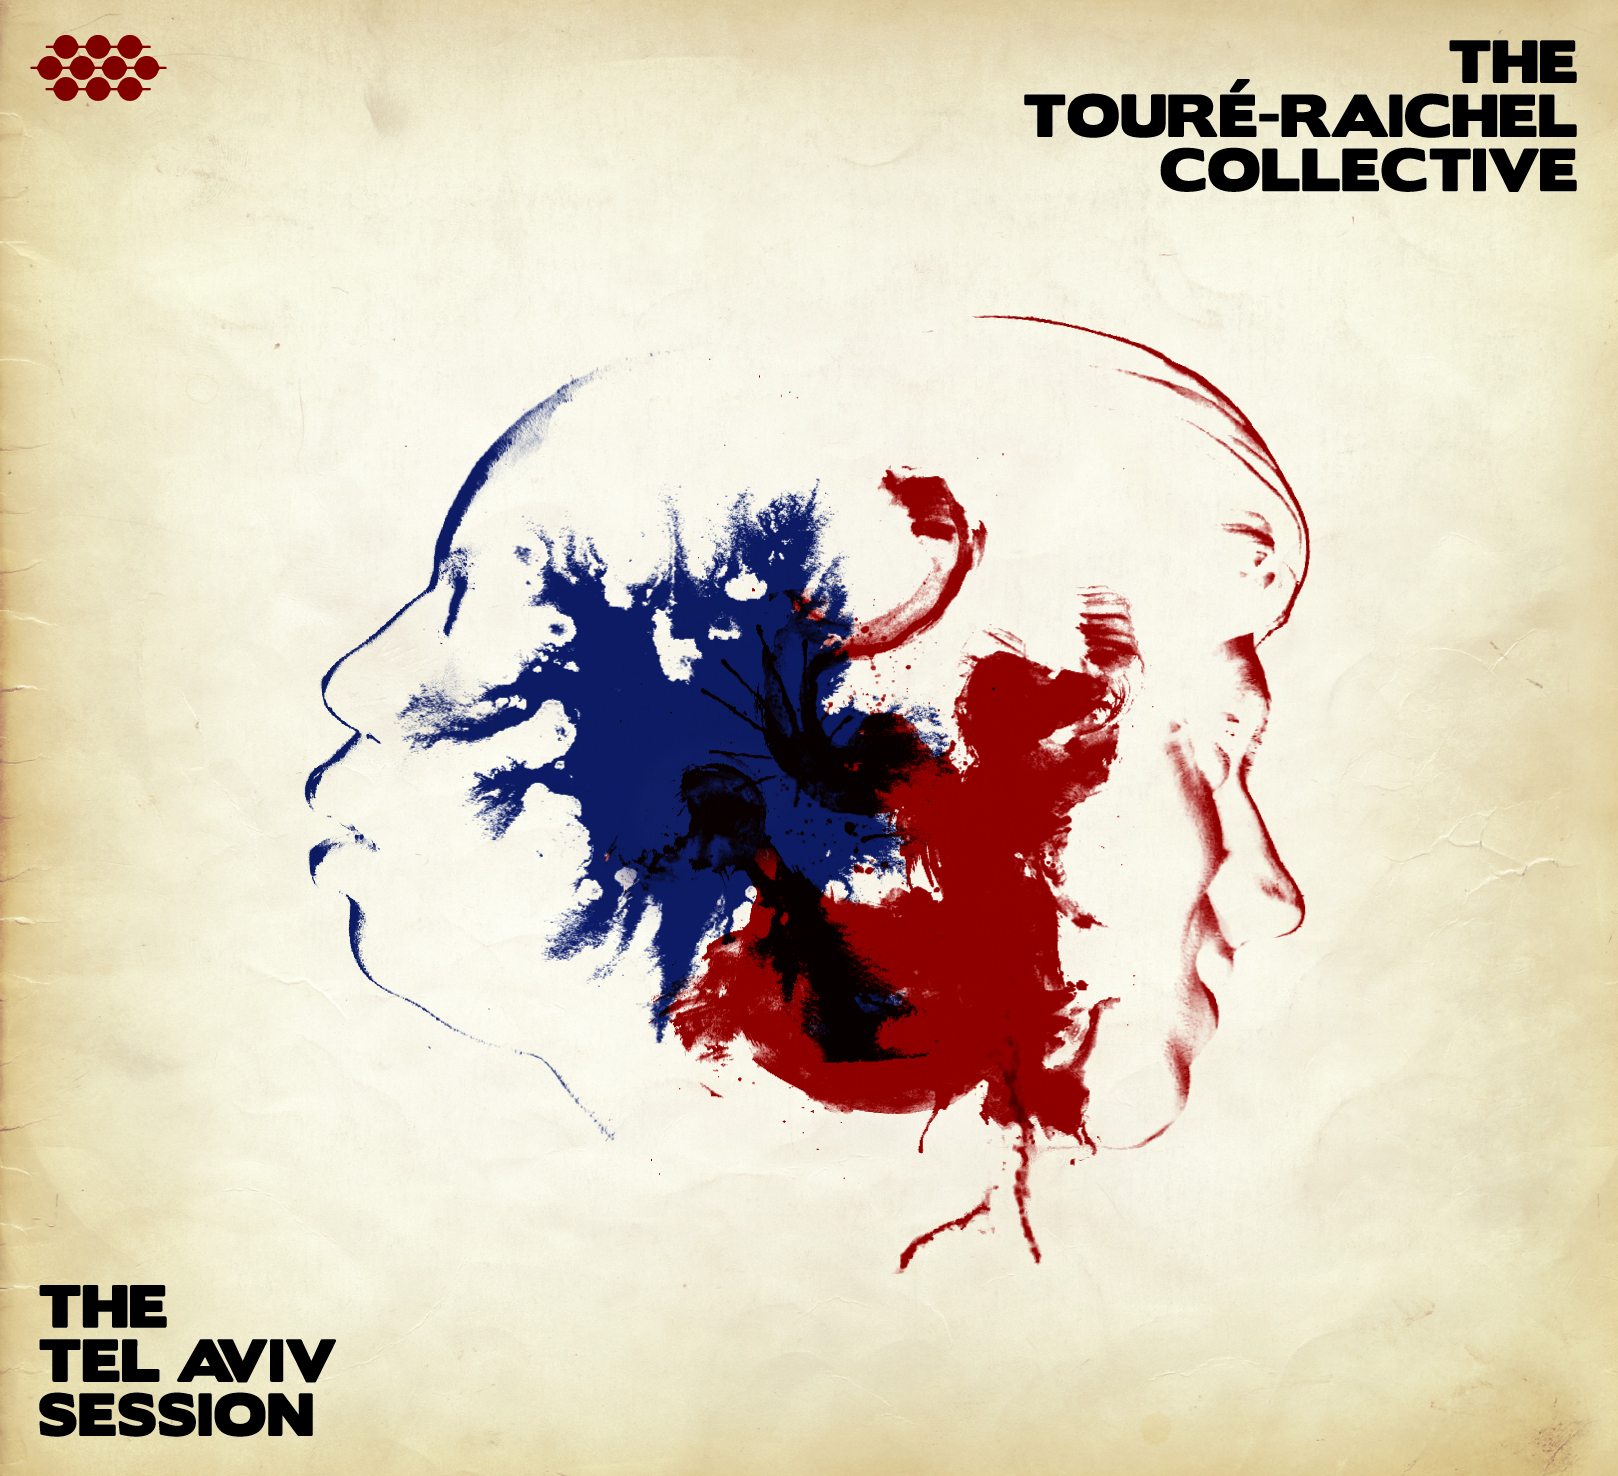 אלבום THE TOURÉ-RAICHEL COLLECTIVE  THE TEL AVIV SESSION עטיפה